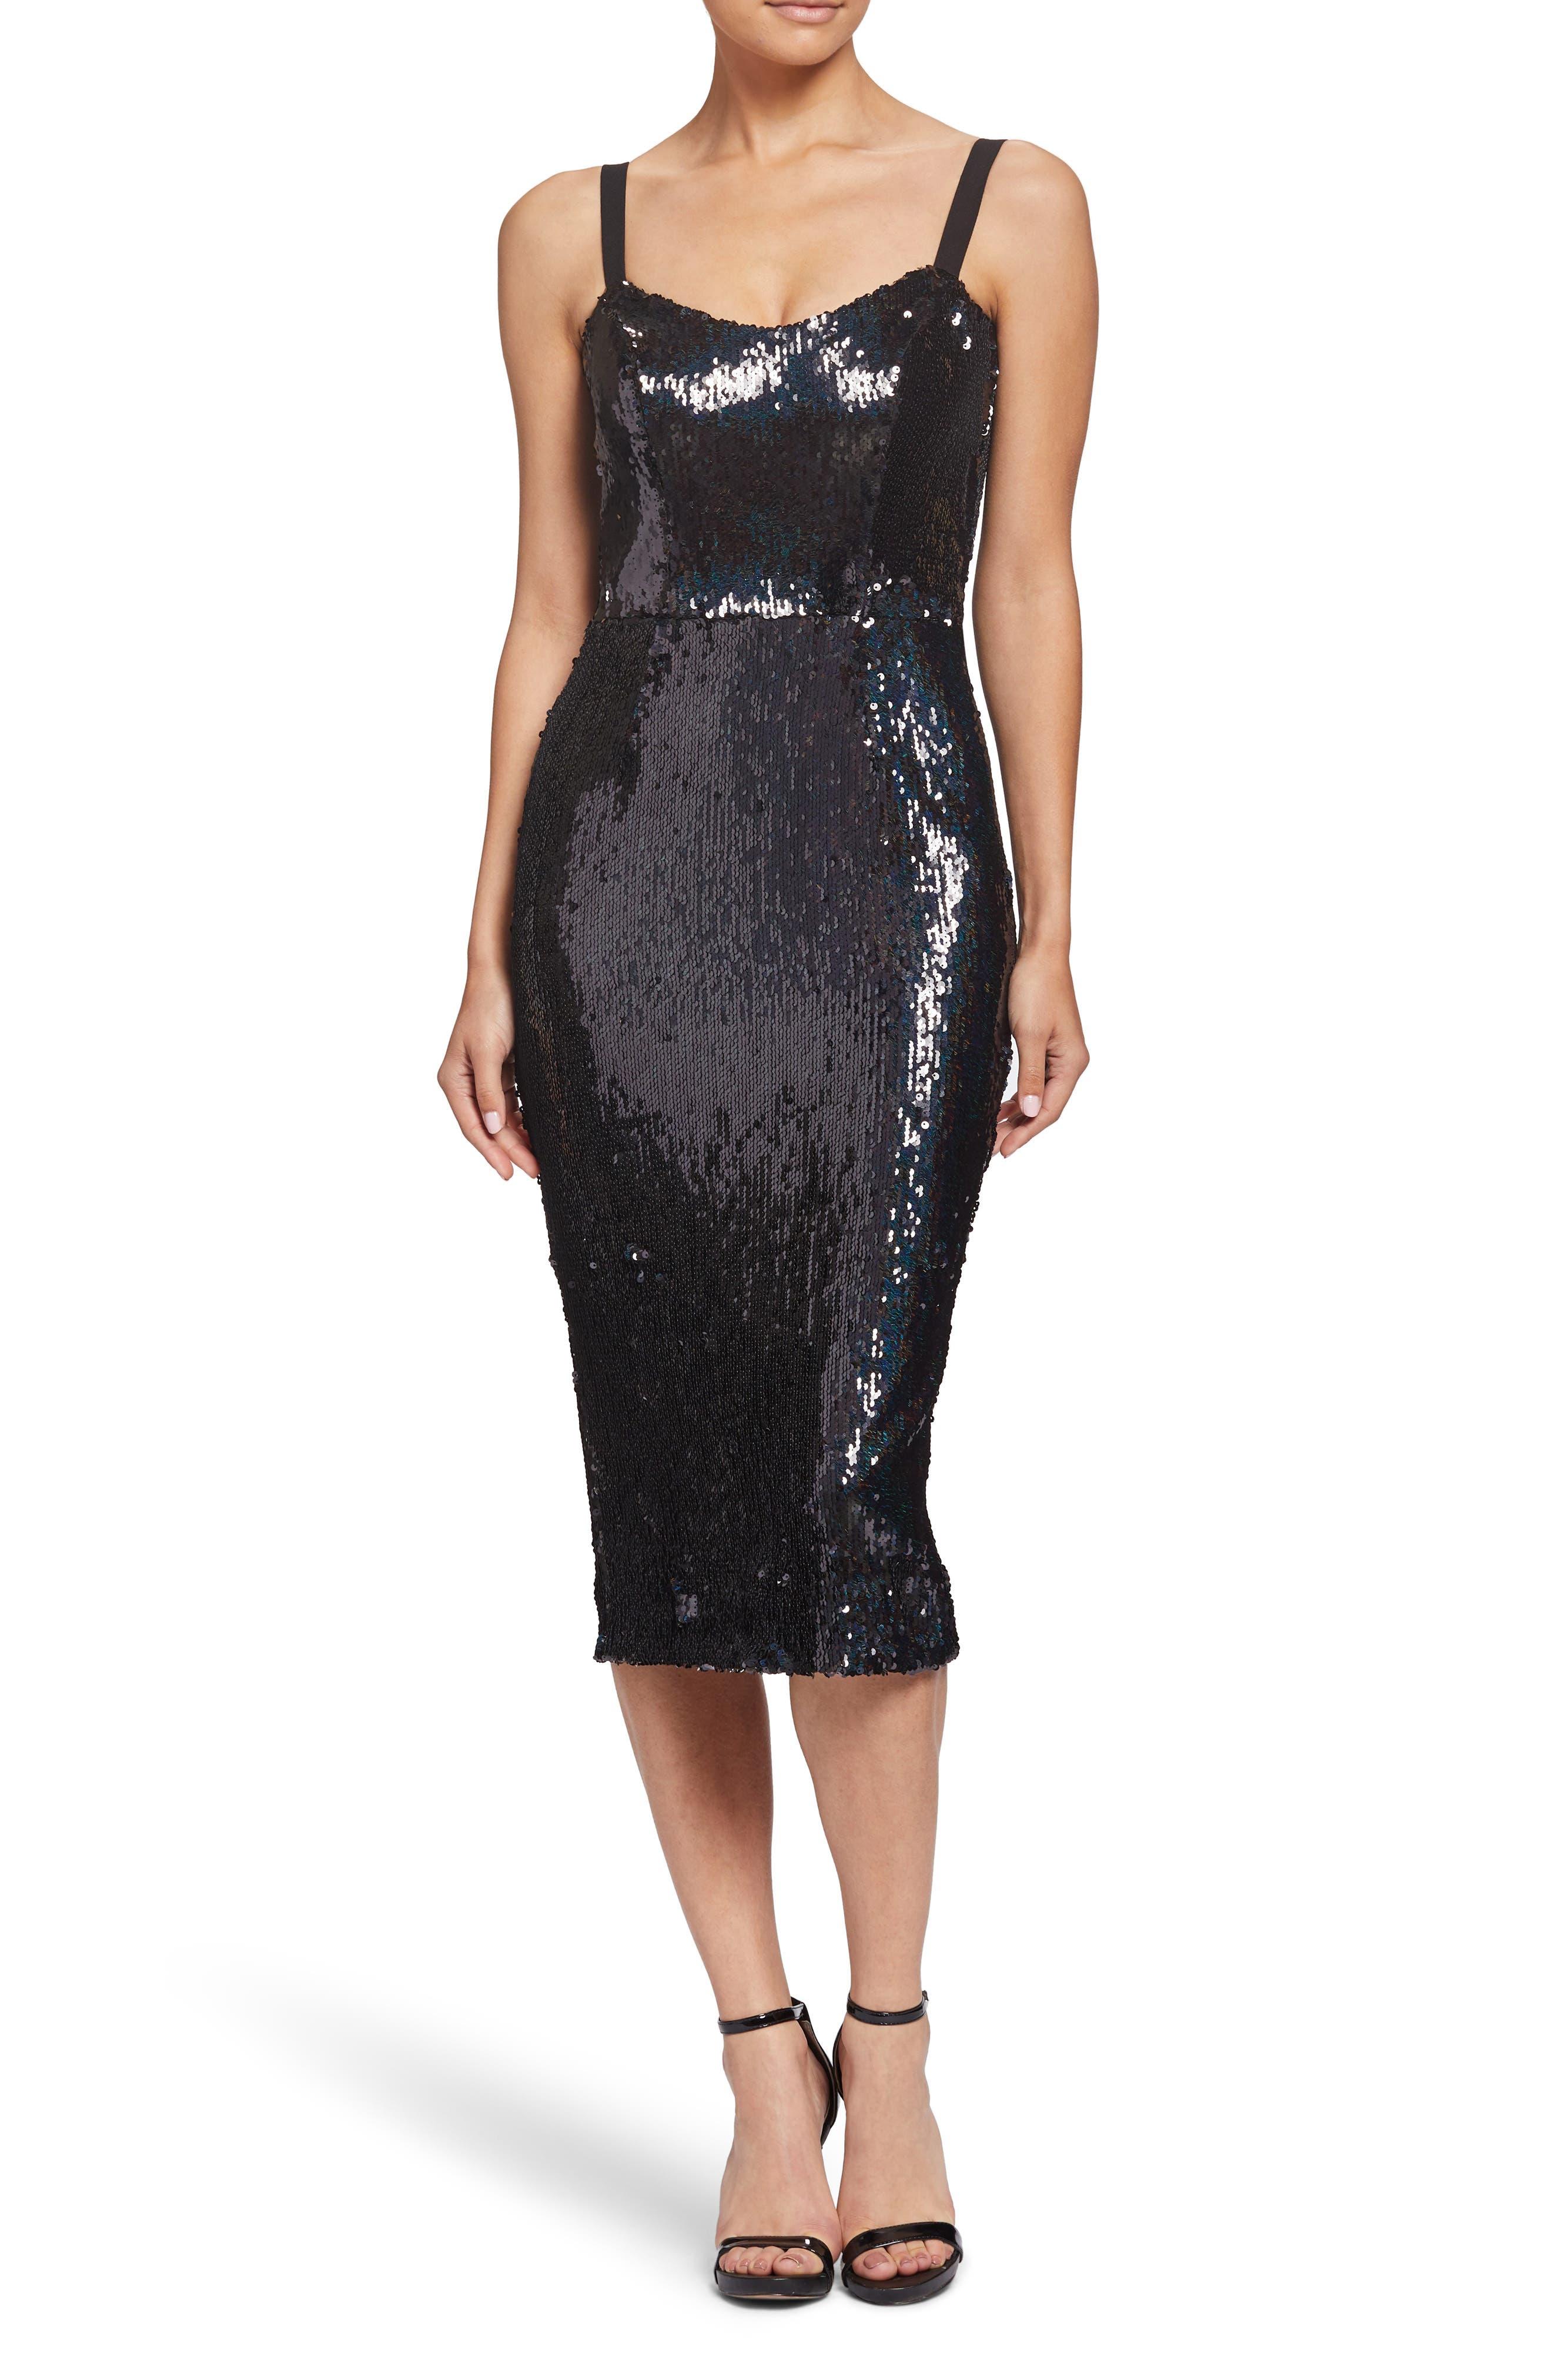 Lynda High Shine Sequin Cocktail Sheath Dress,                             Main thumbnail 1, color,                             BLACK PEARL